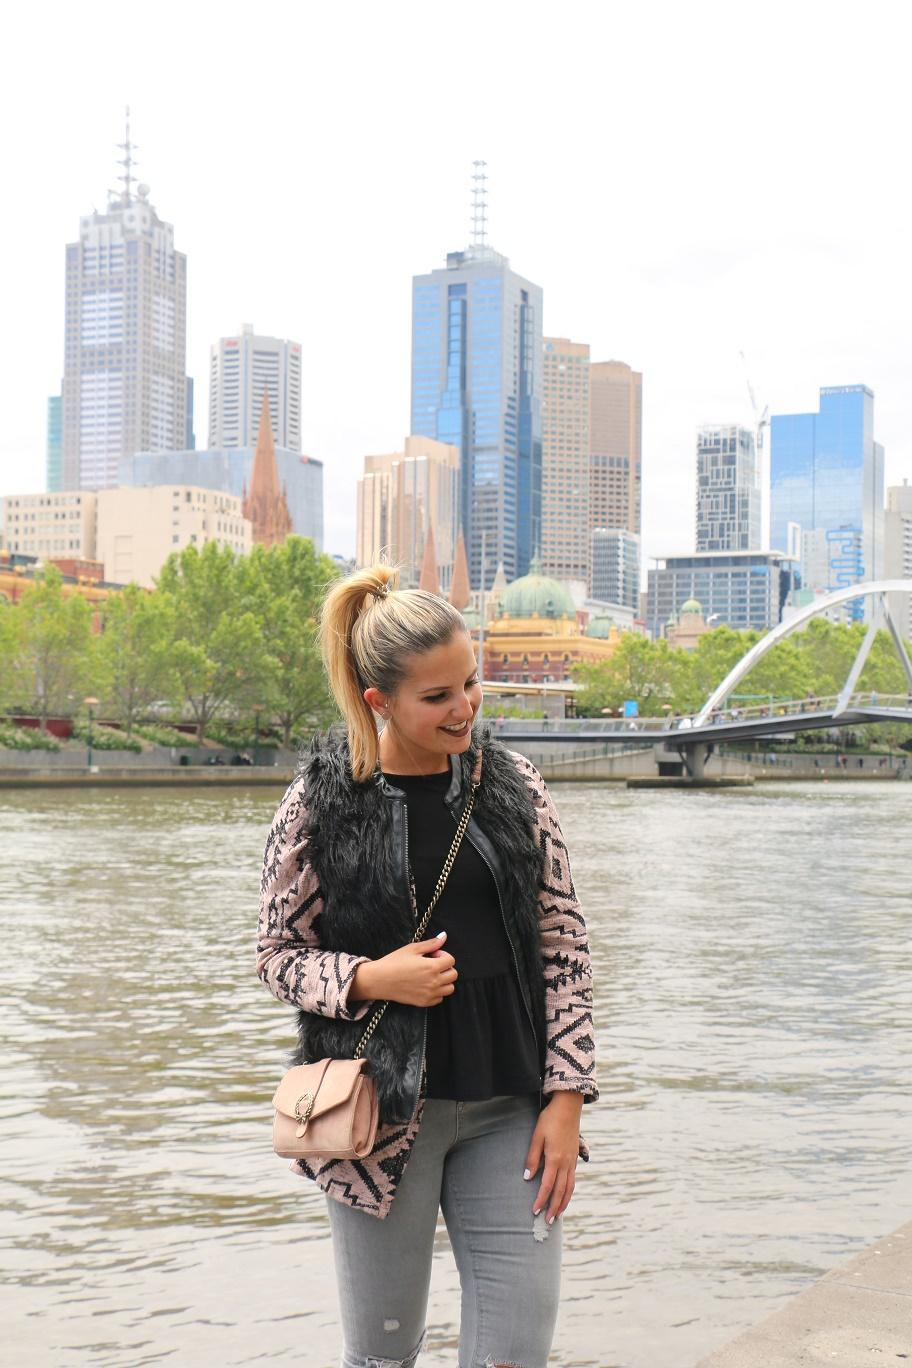 melbourne-yarra-river-thebraidedgirl